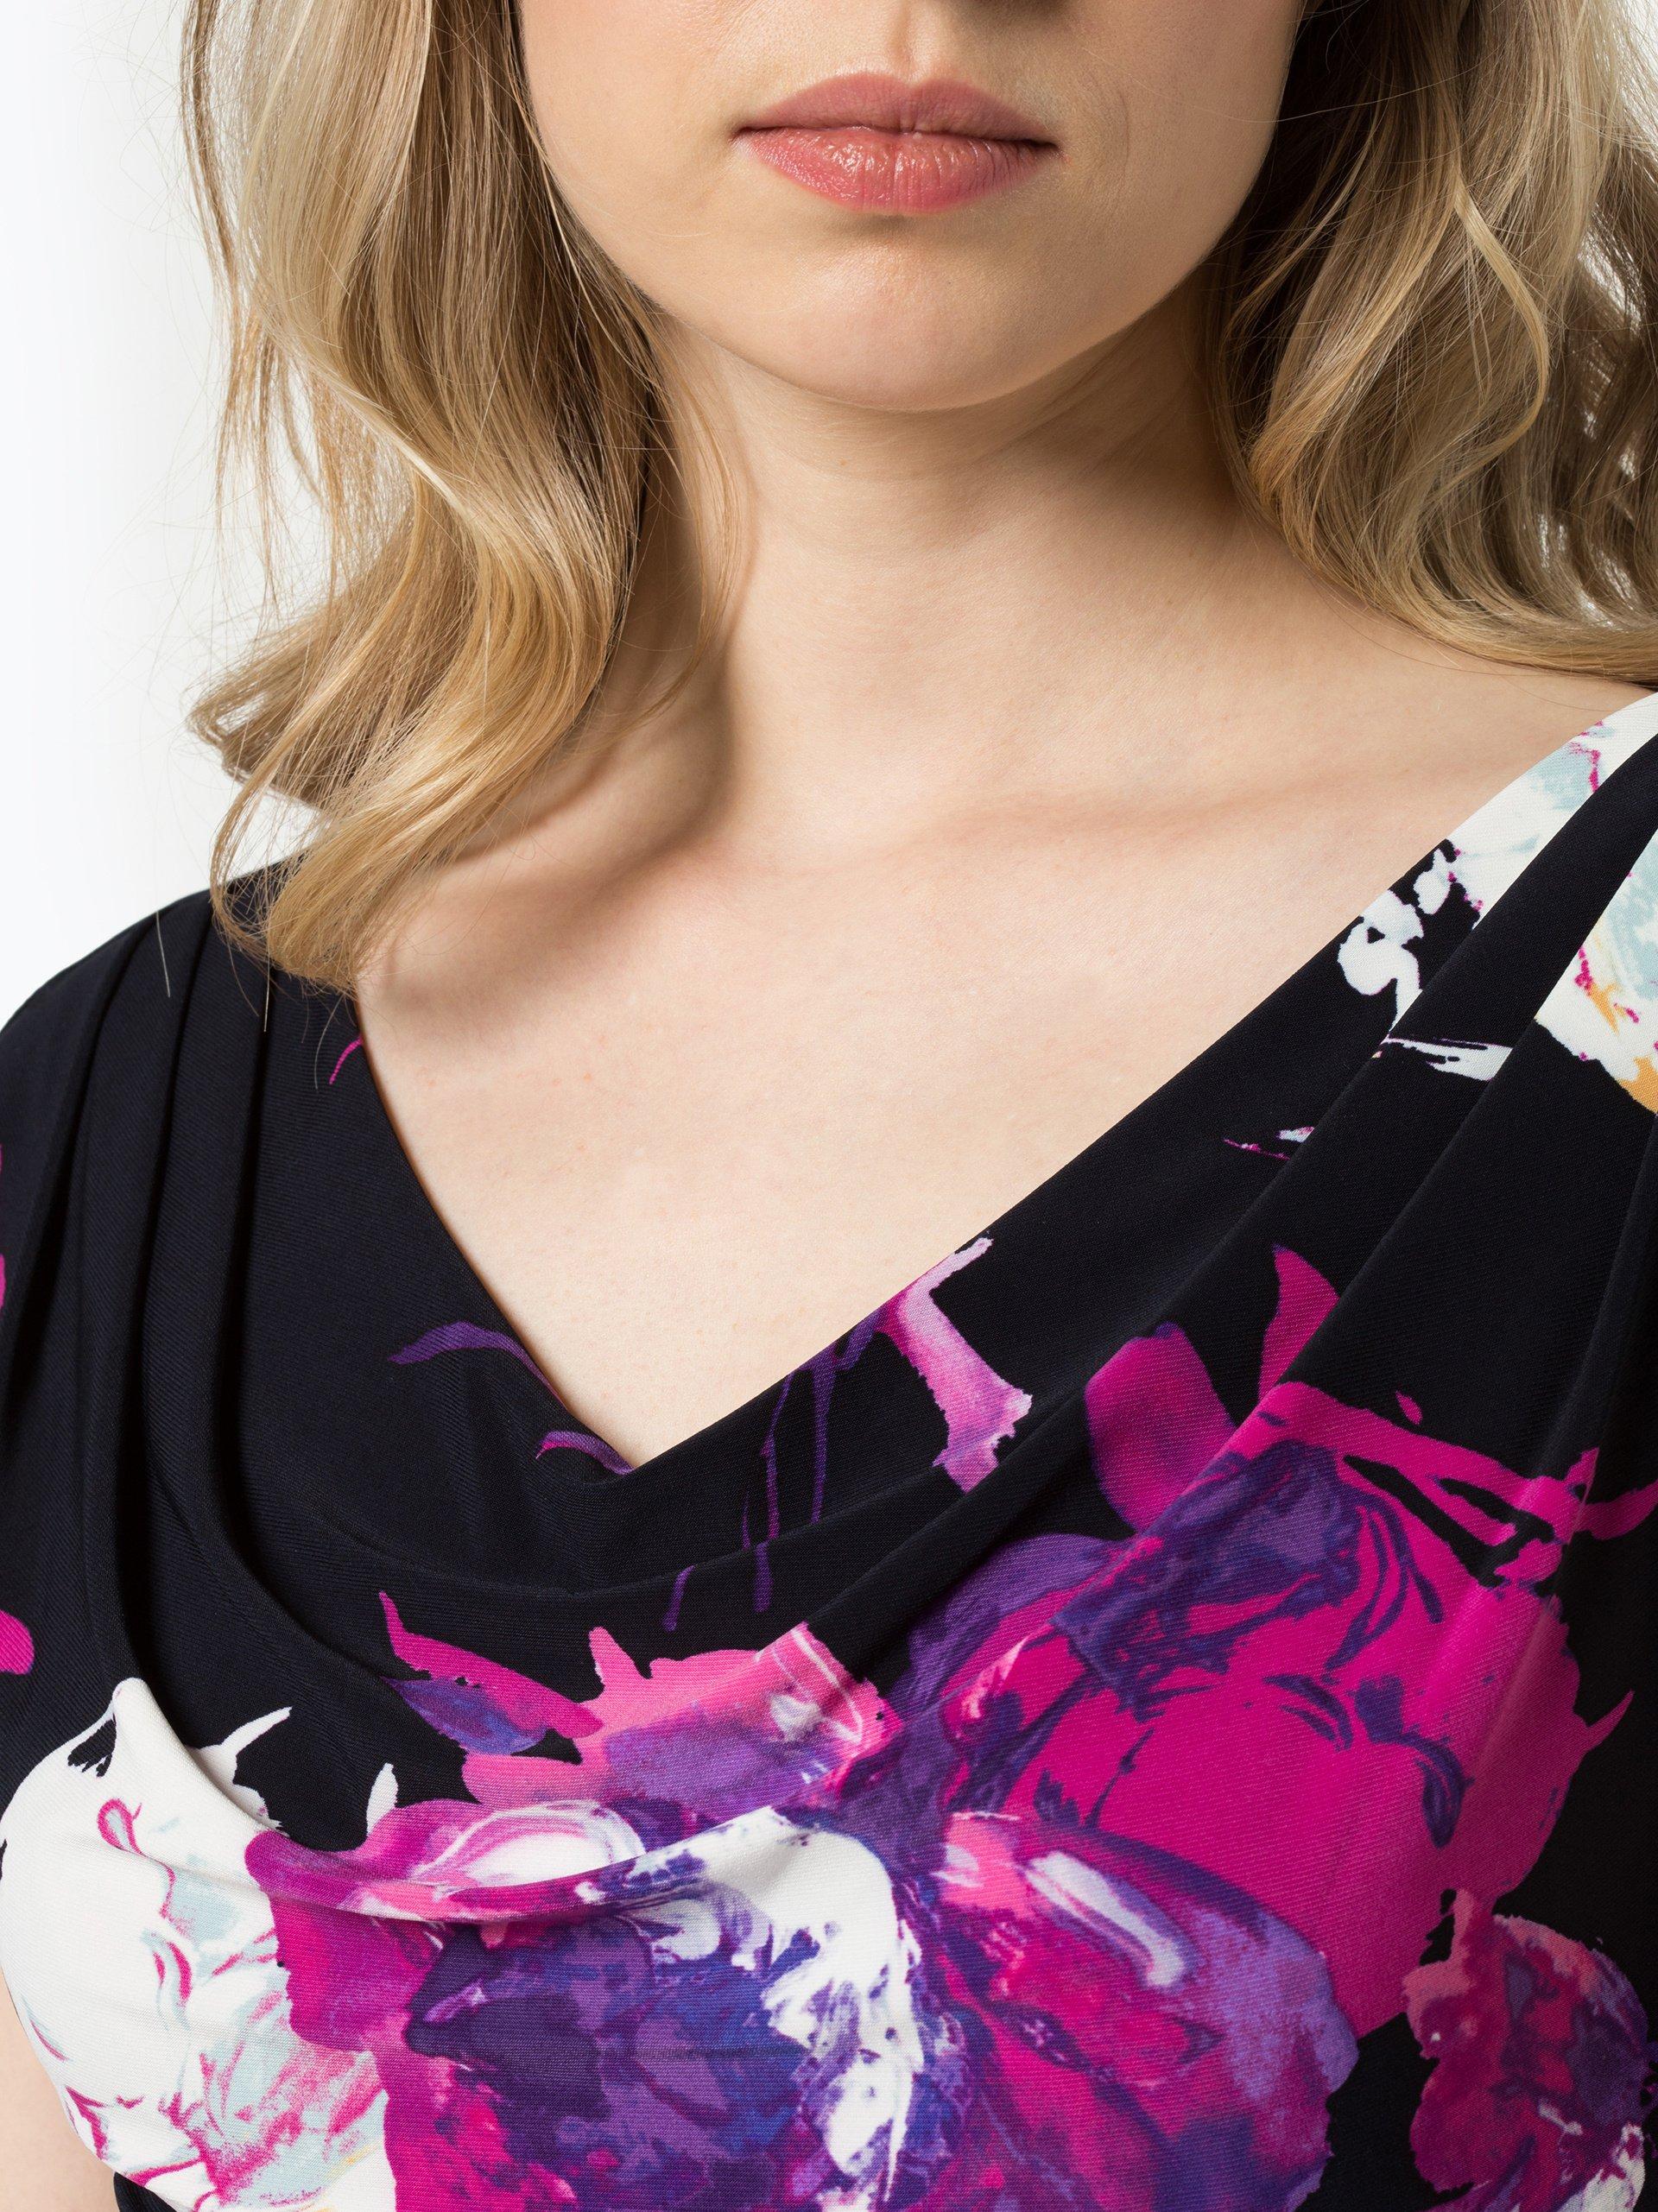 lauren ralph lauren damen kleid marine fuchsia gemustert online kaufen peek und cloppenburg de. Black Bedroom Furniture Sets. Home Design Ideas